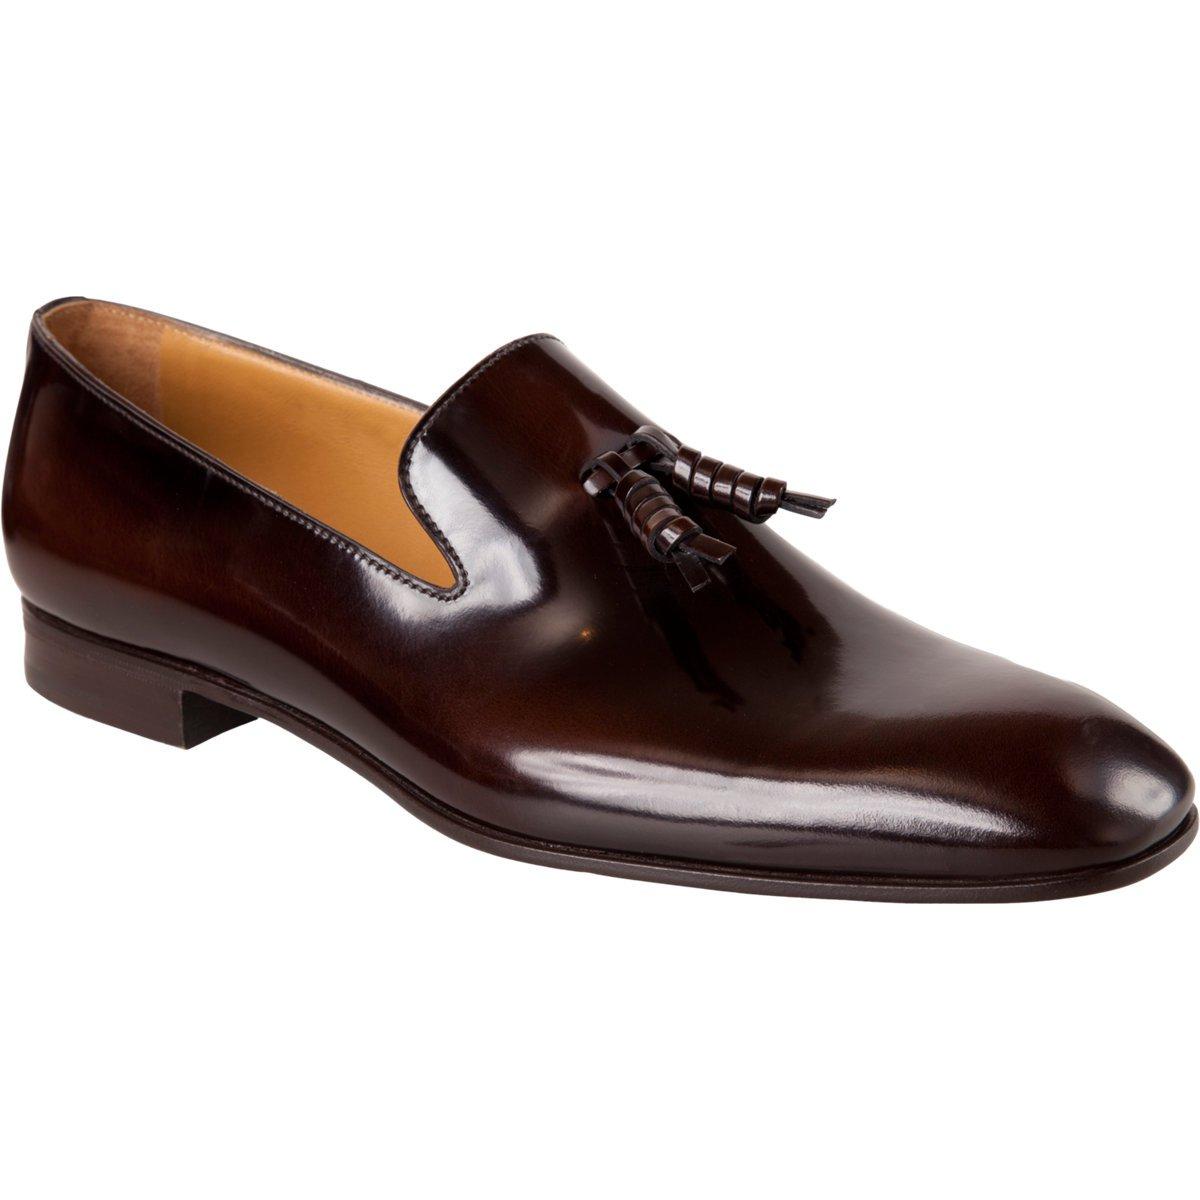 prada leather loafer